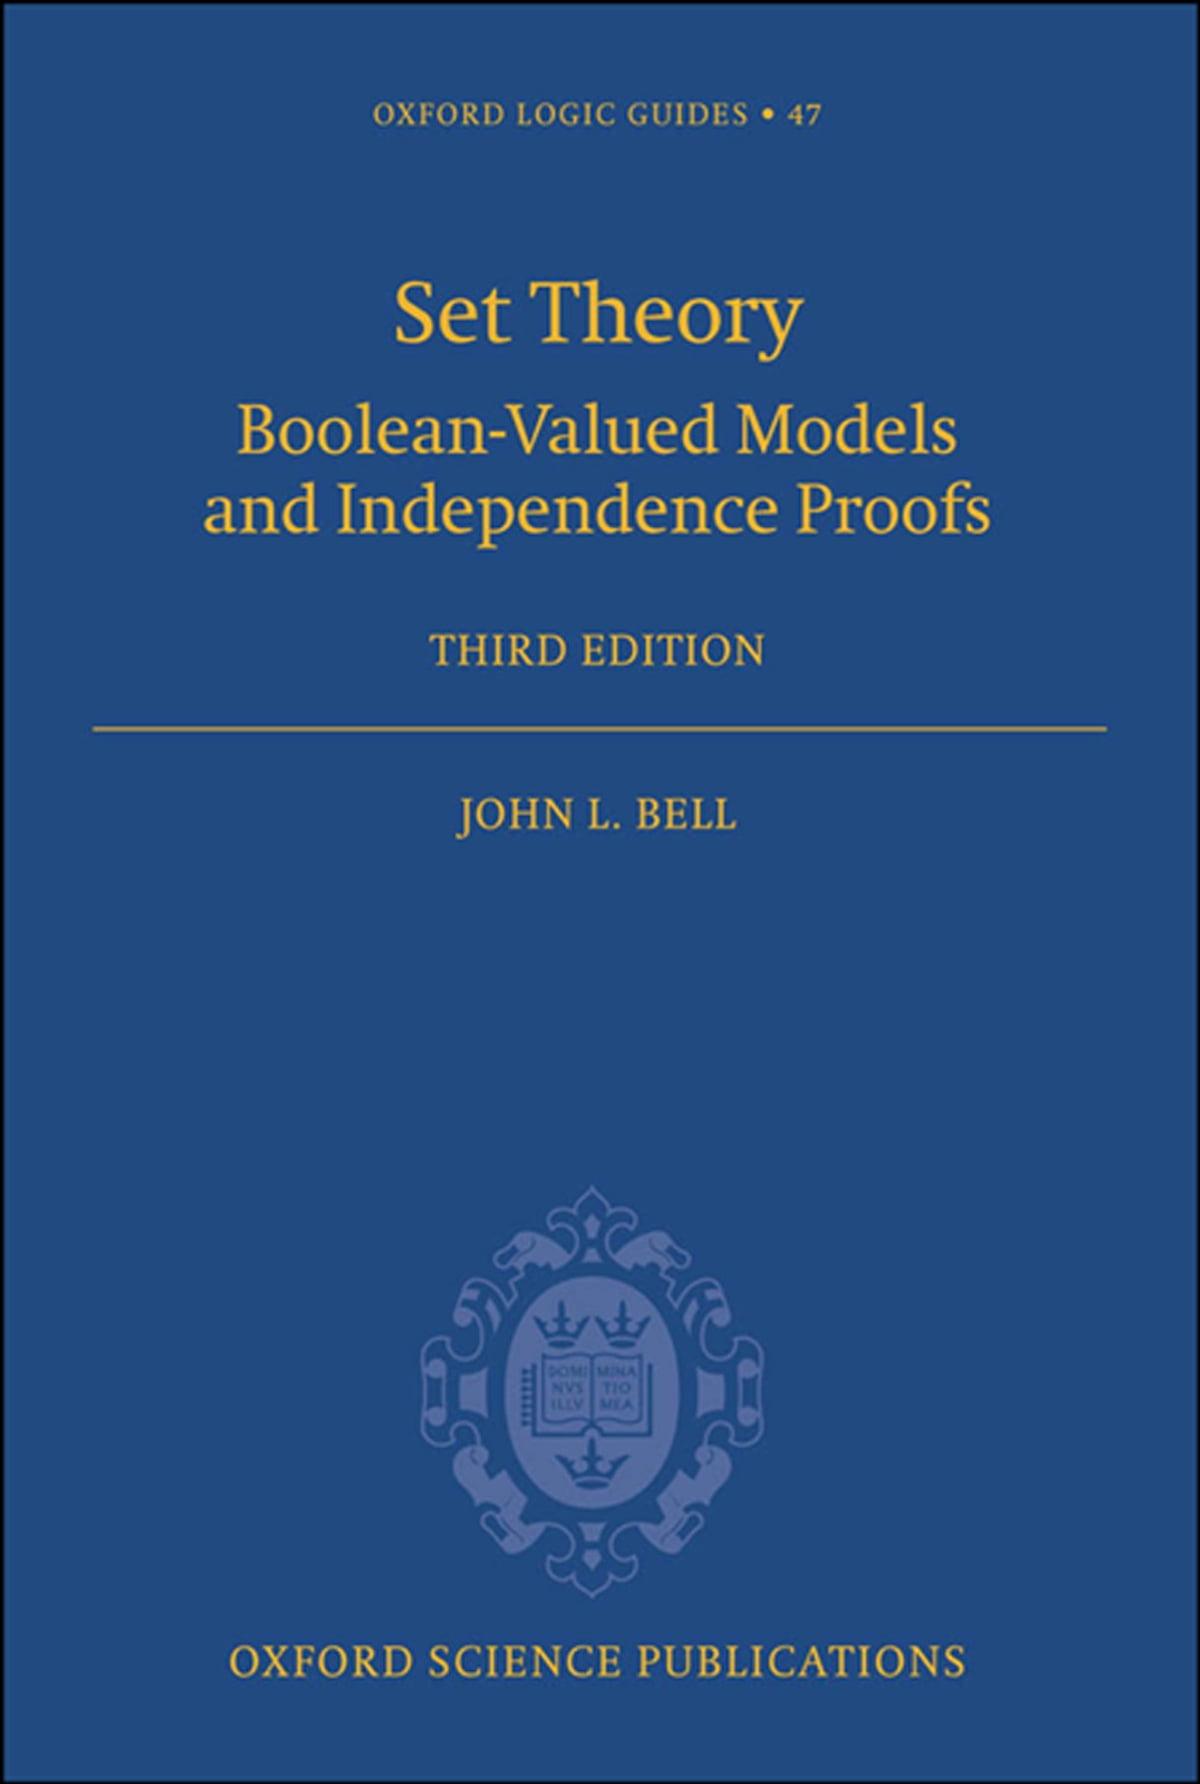 Set Theory eBook by John L. Bell - 9780191620829   Rakuten Kobo